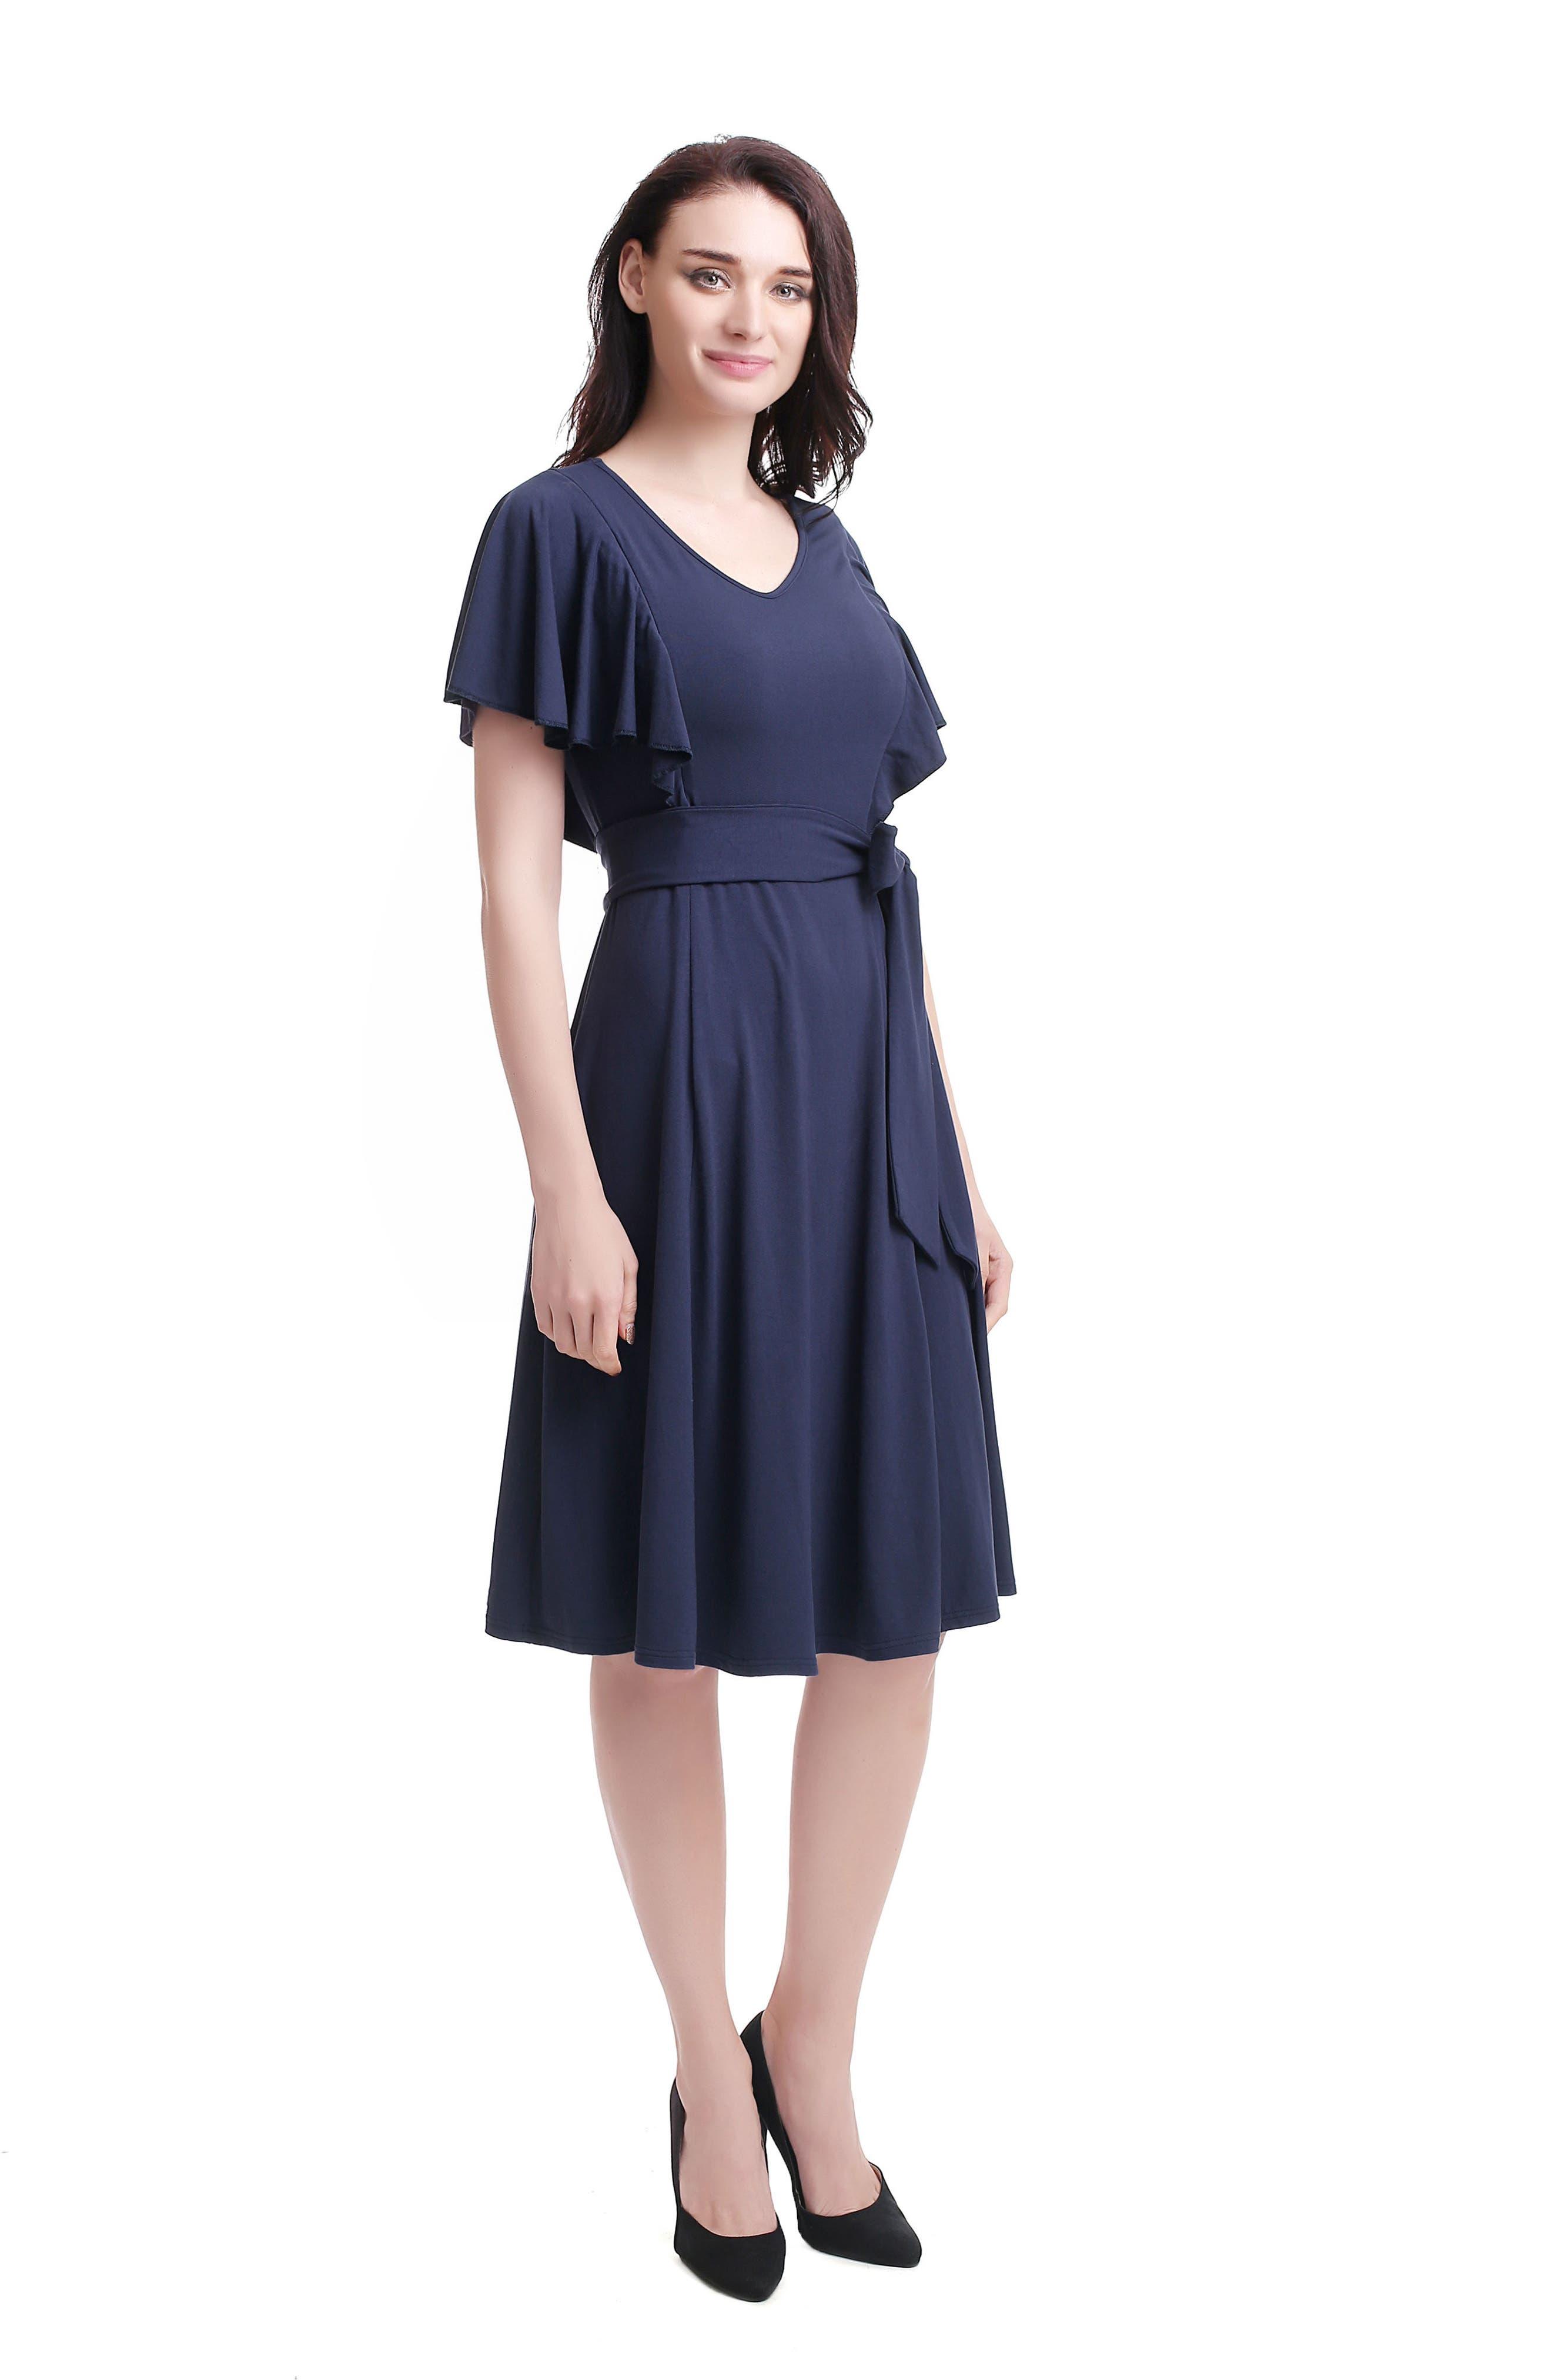 Kimi & Kai Rhea Tie Maternity/Nursing Skater Dress,                             Alternate thumbnail 5, color,                             NAVY